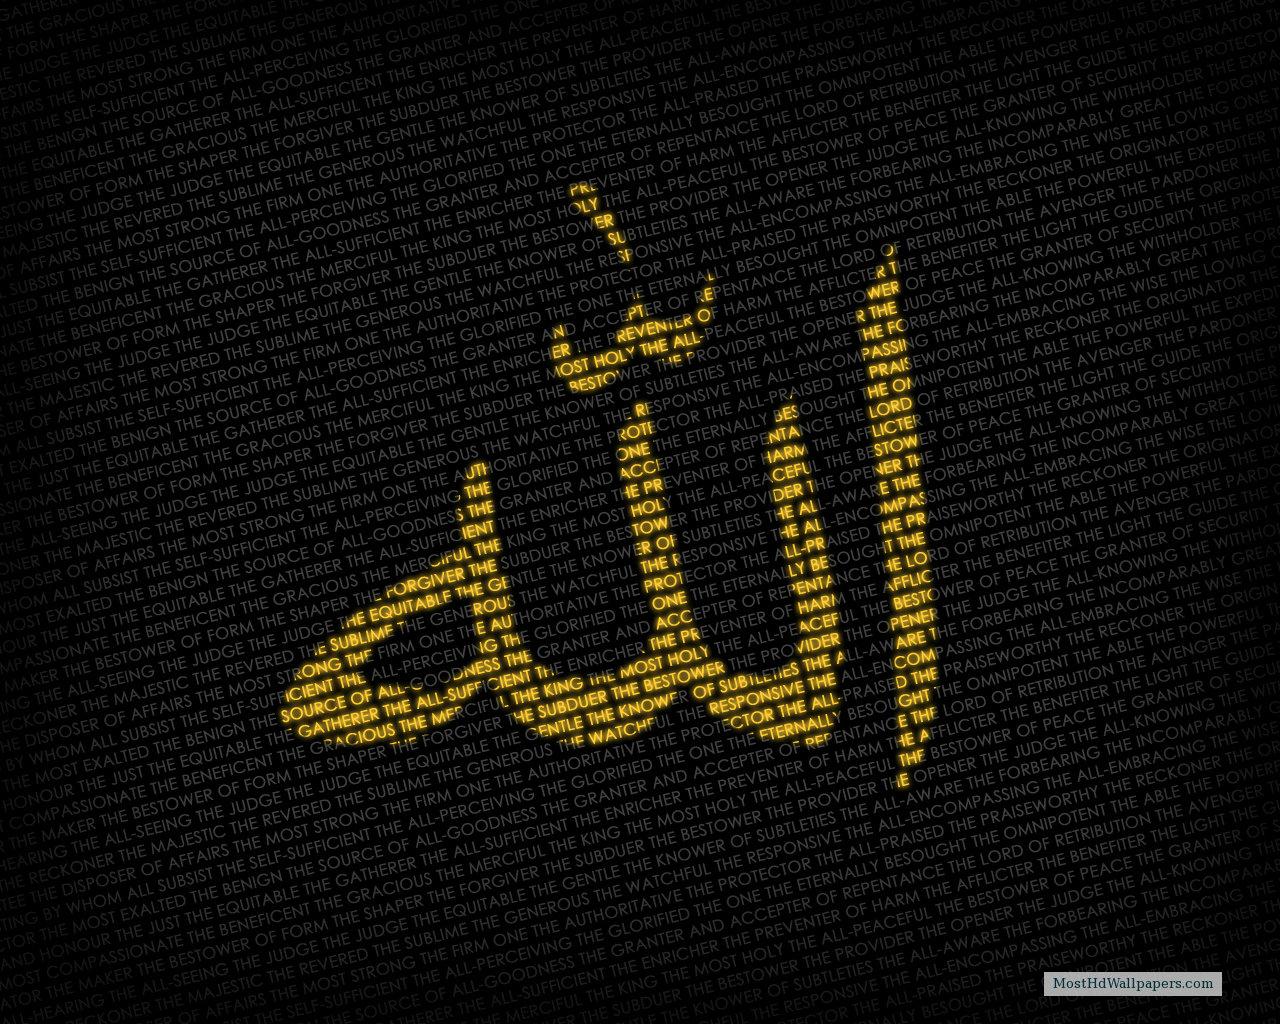 Free Download Islamic Hd Wallpapers Islamic Hd Wallpapers